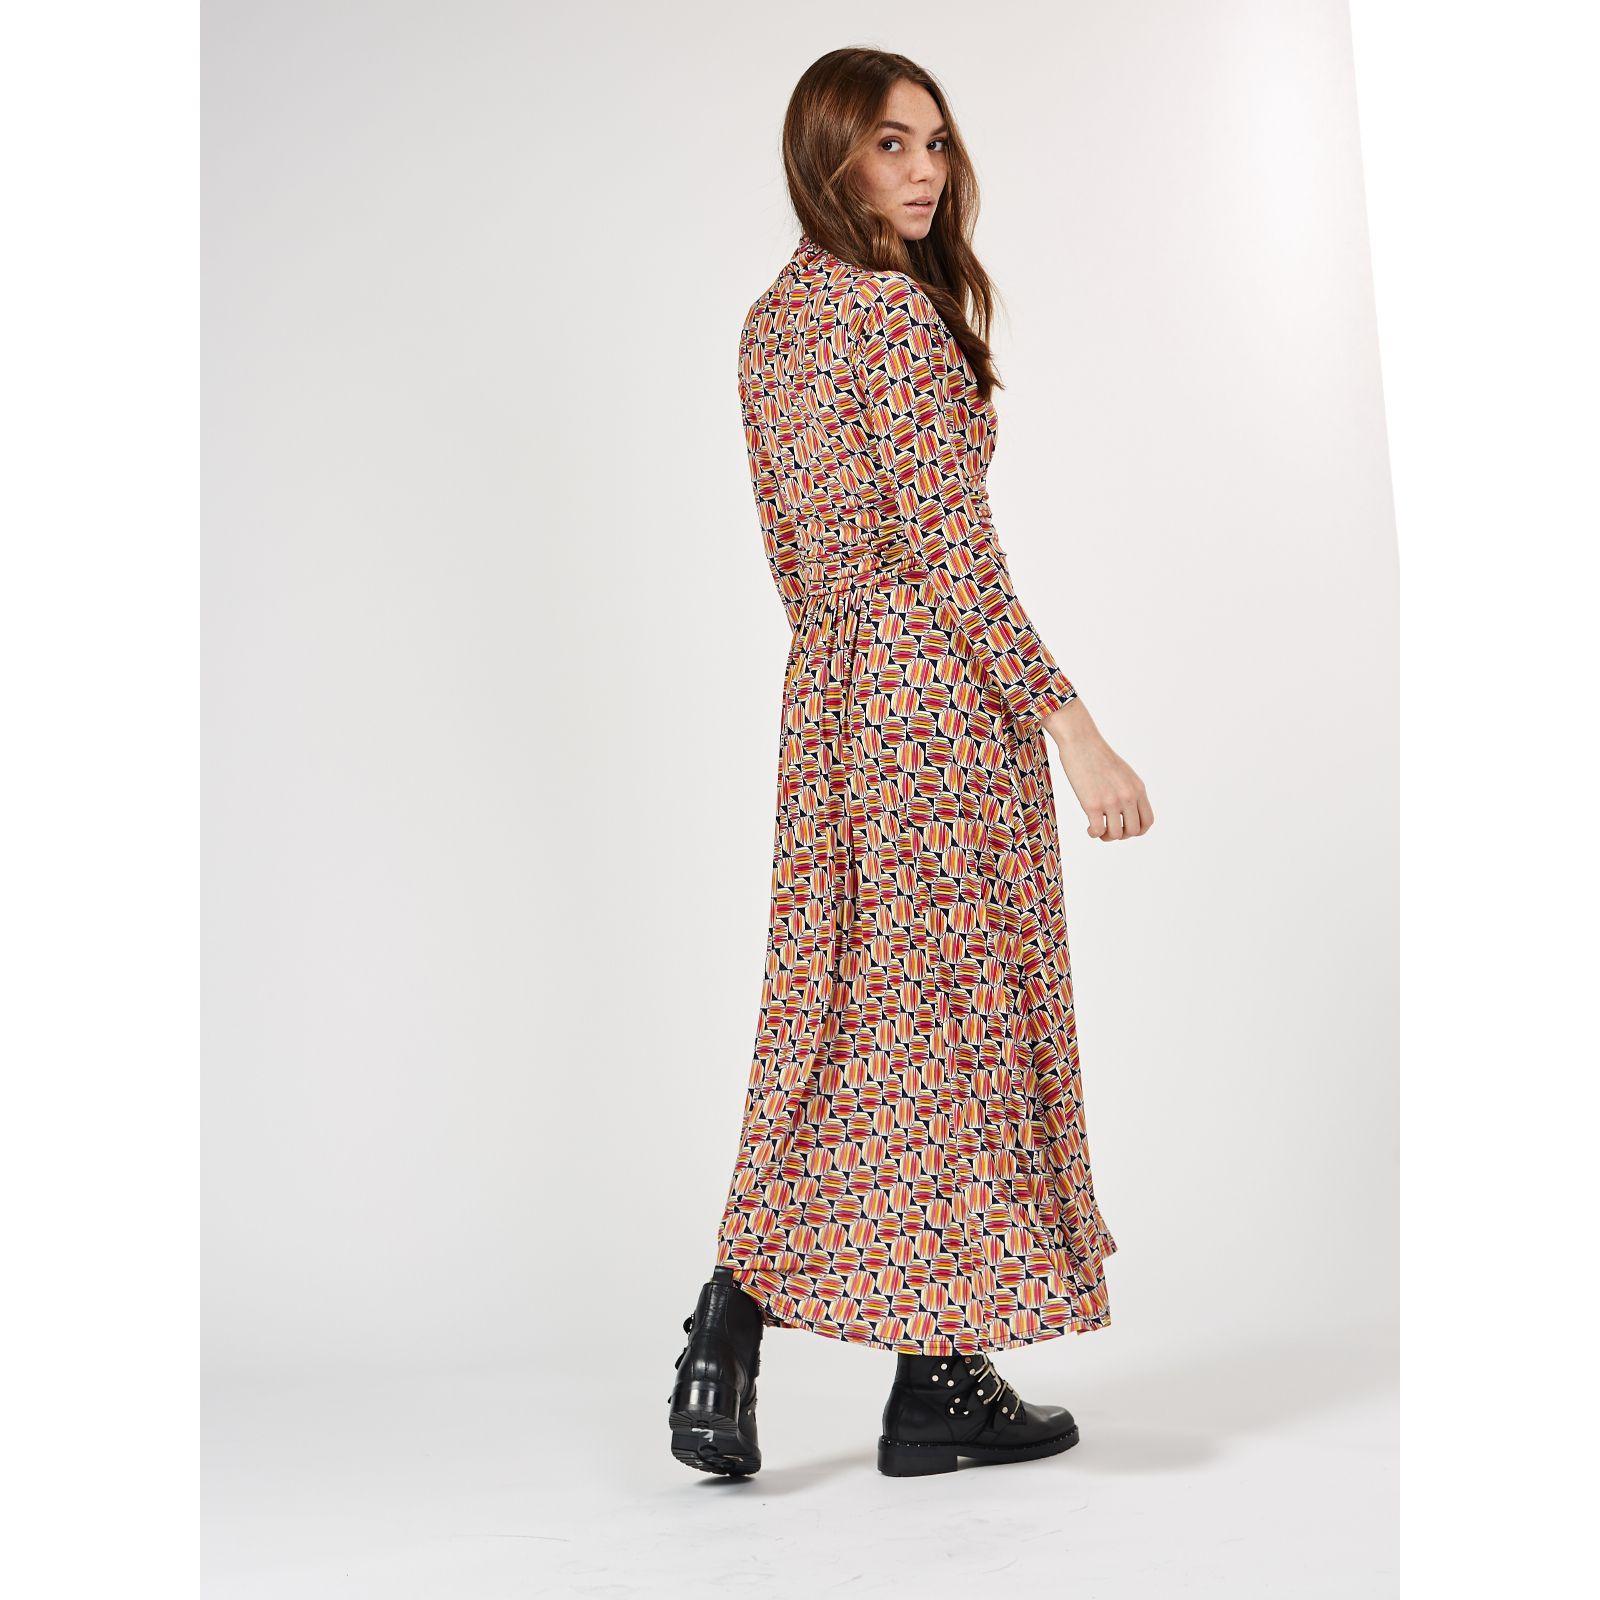 28ecf108a92 Lauren High Neck Printed Maxi Dress by Onjenu London - QVC UK